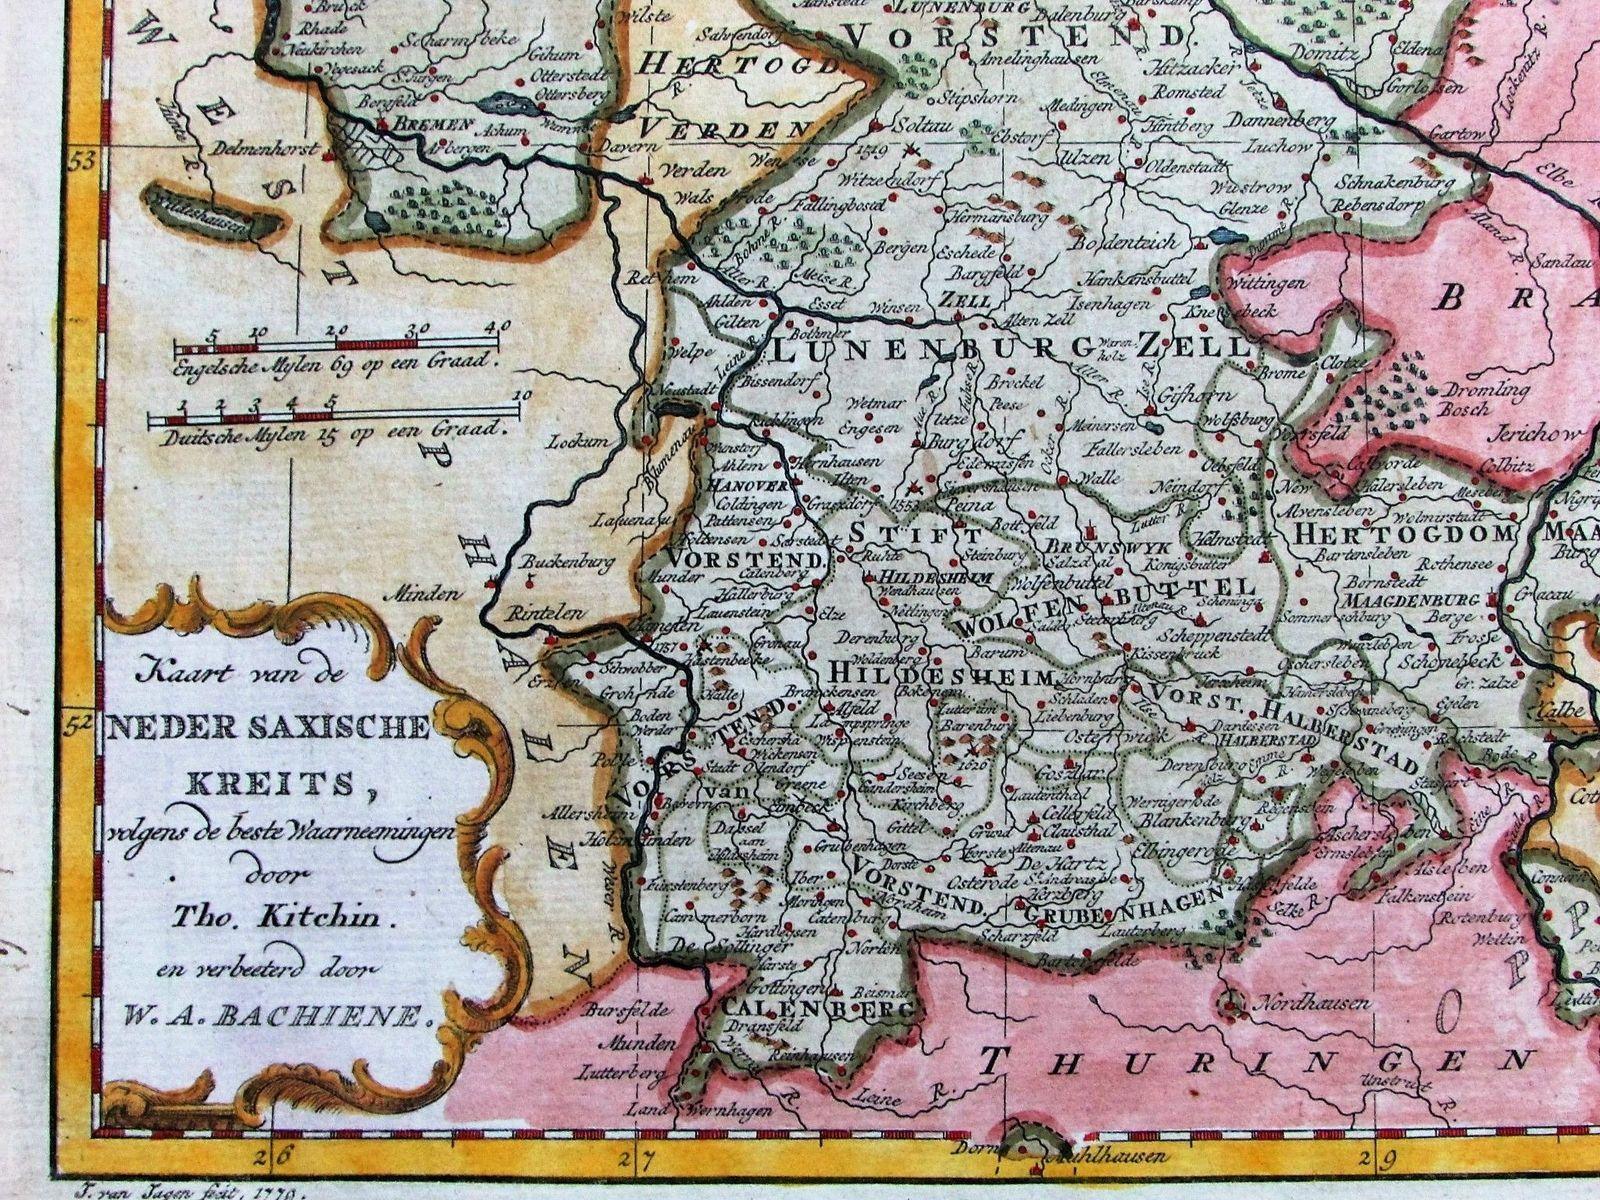 Northern Germany Holstein Brandenburg Pomerania 1778 Rare Bachiene